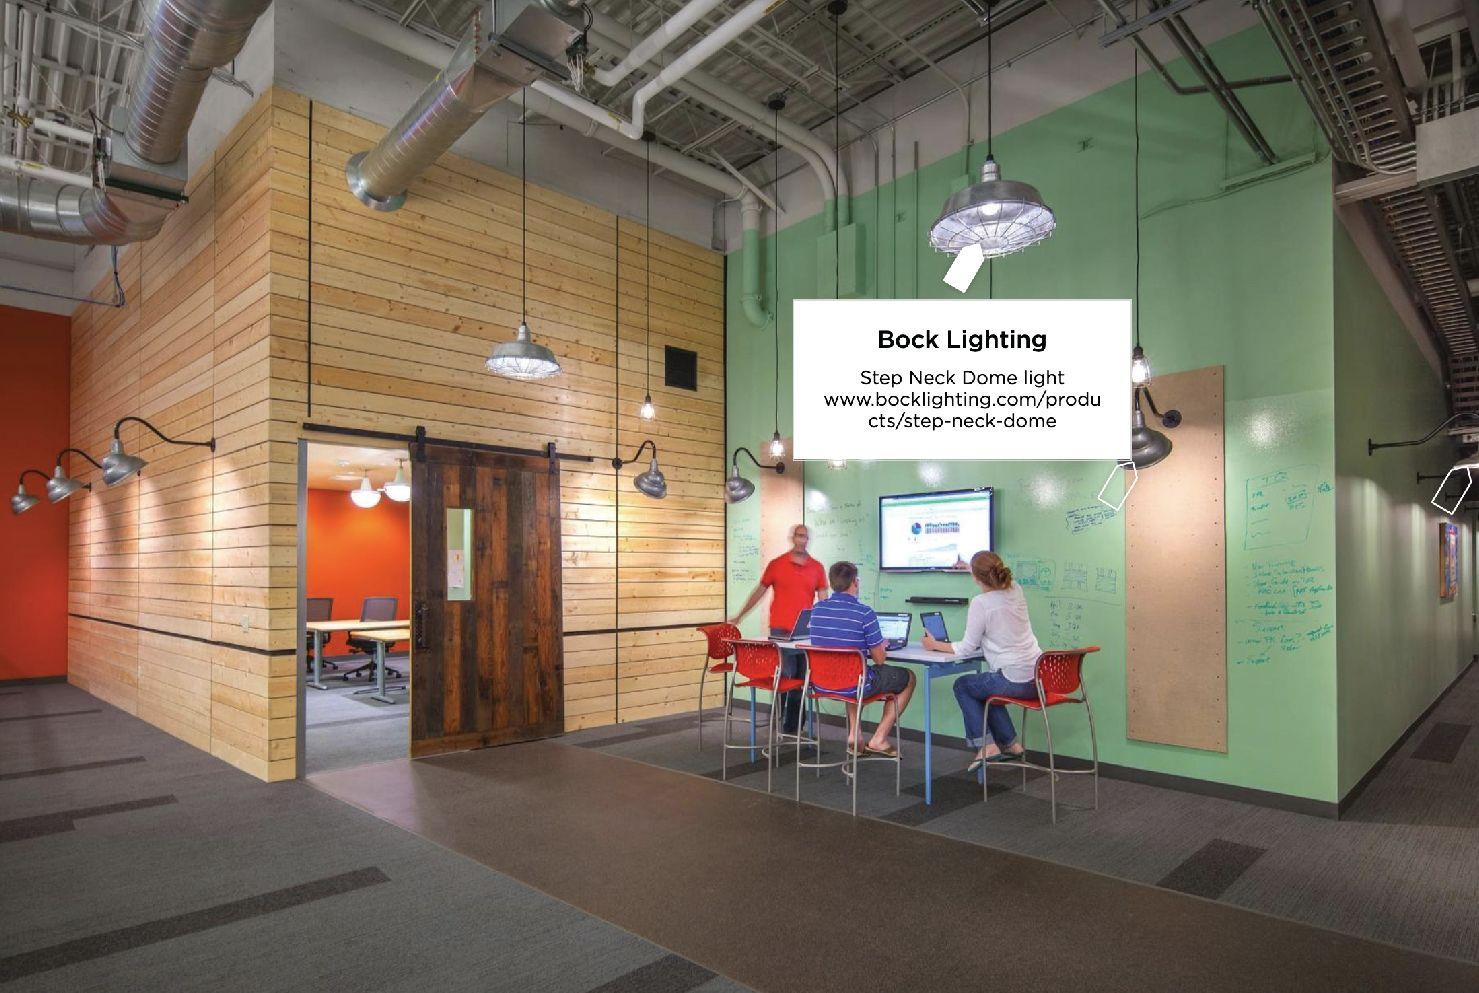 Bock Lighting Paradigm Office Design Mortarr Com Office Space Design Office Space Corporate Commercial Design